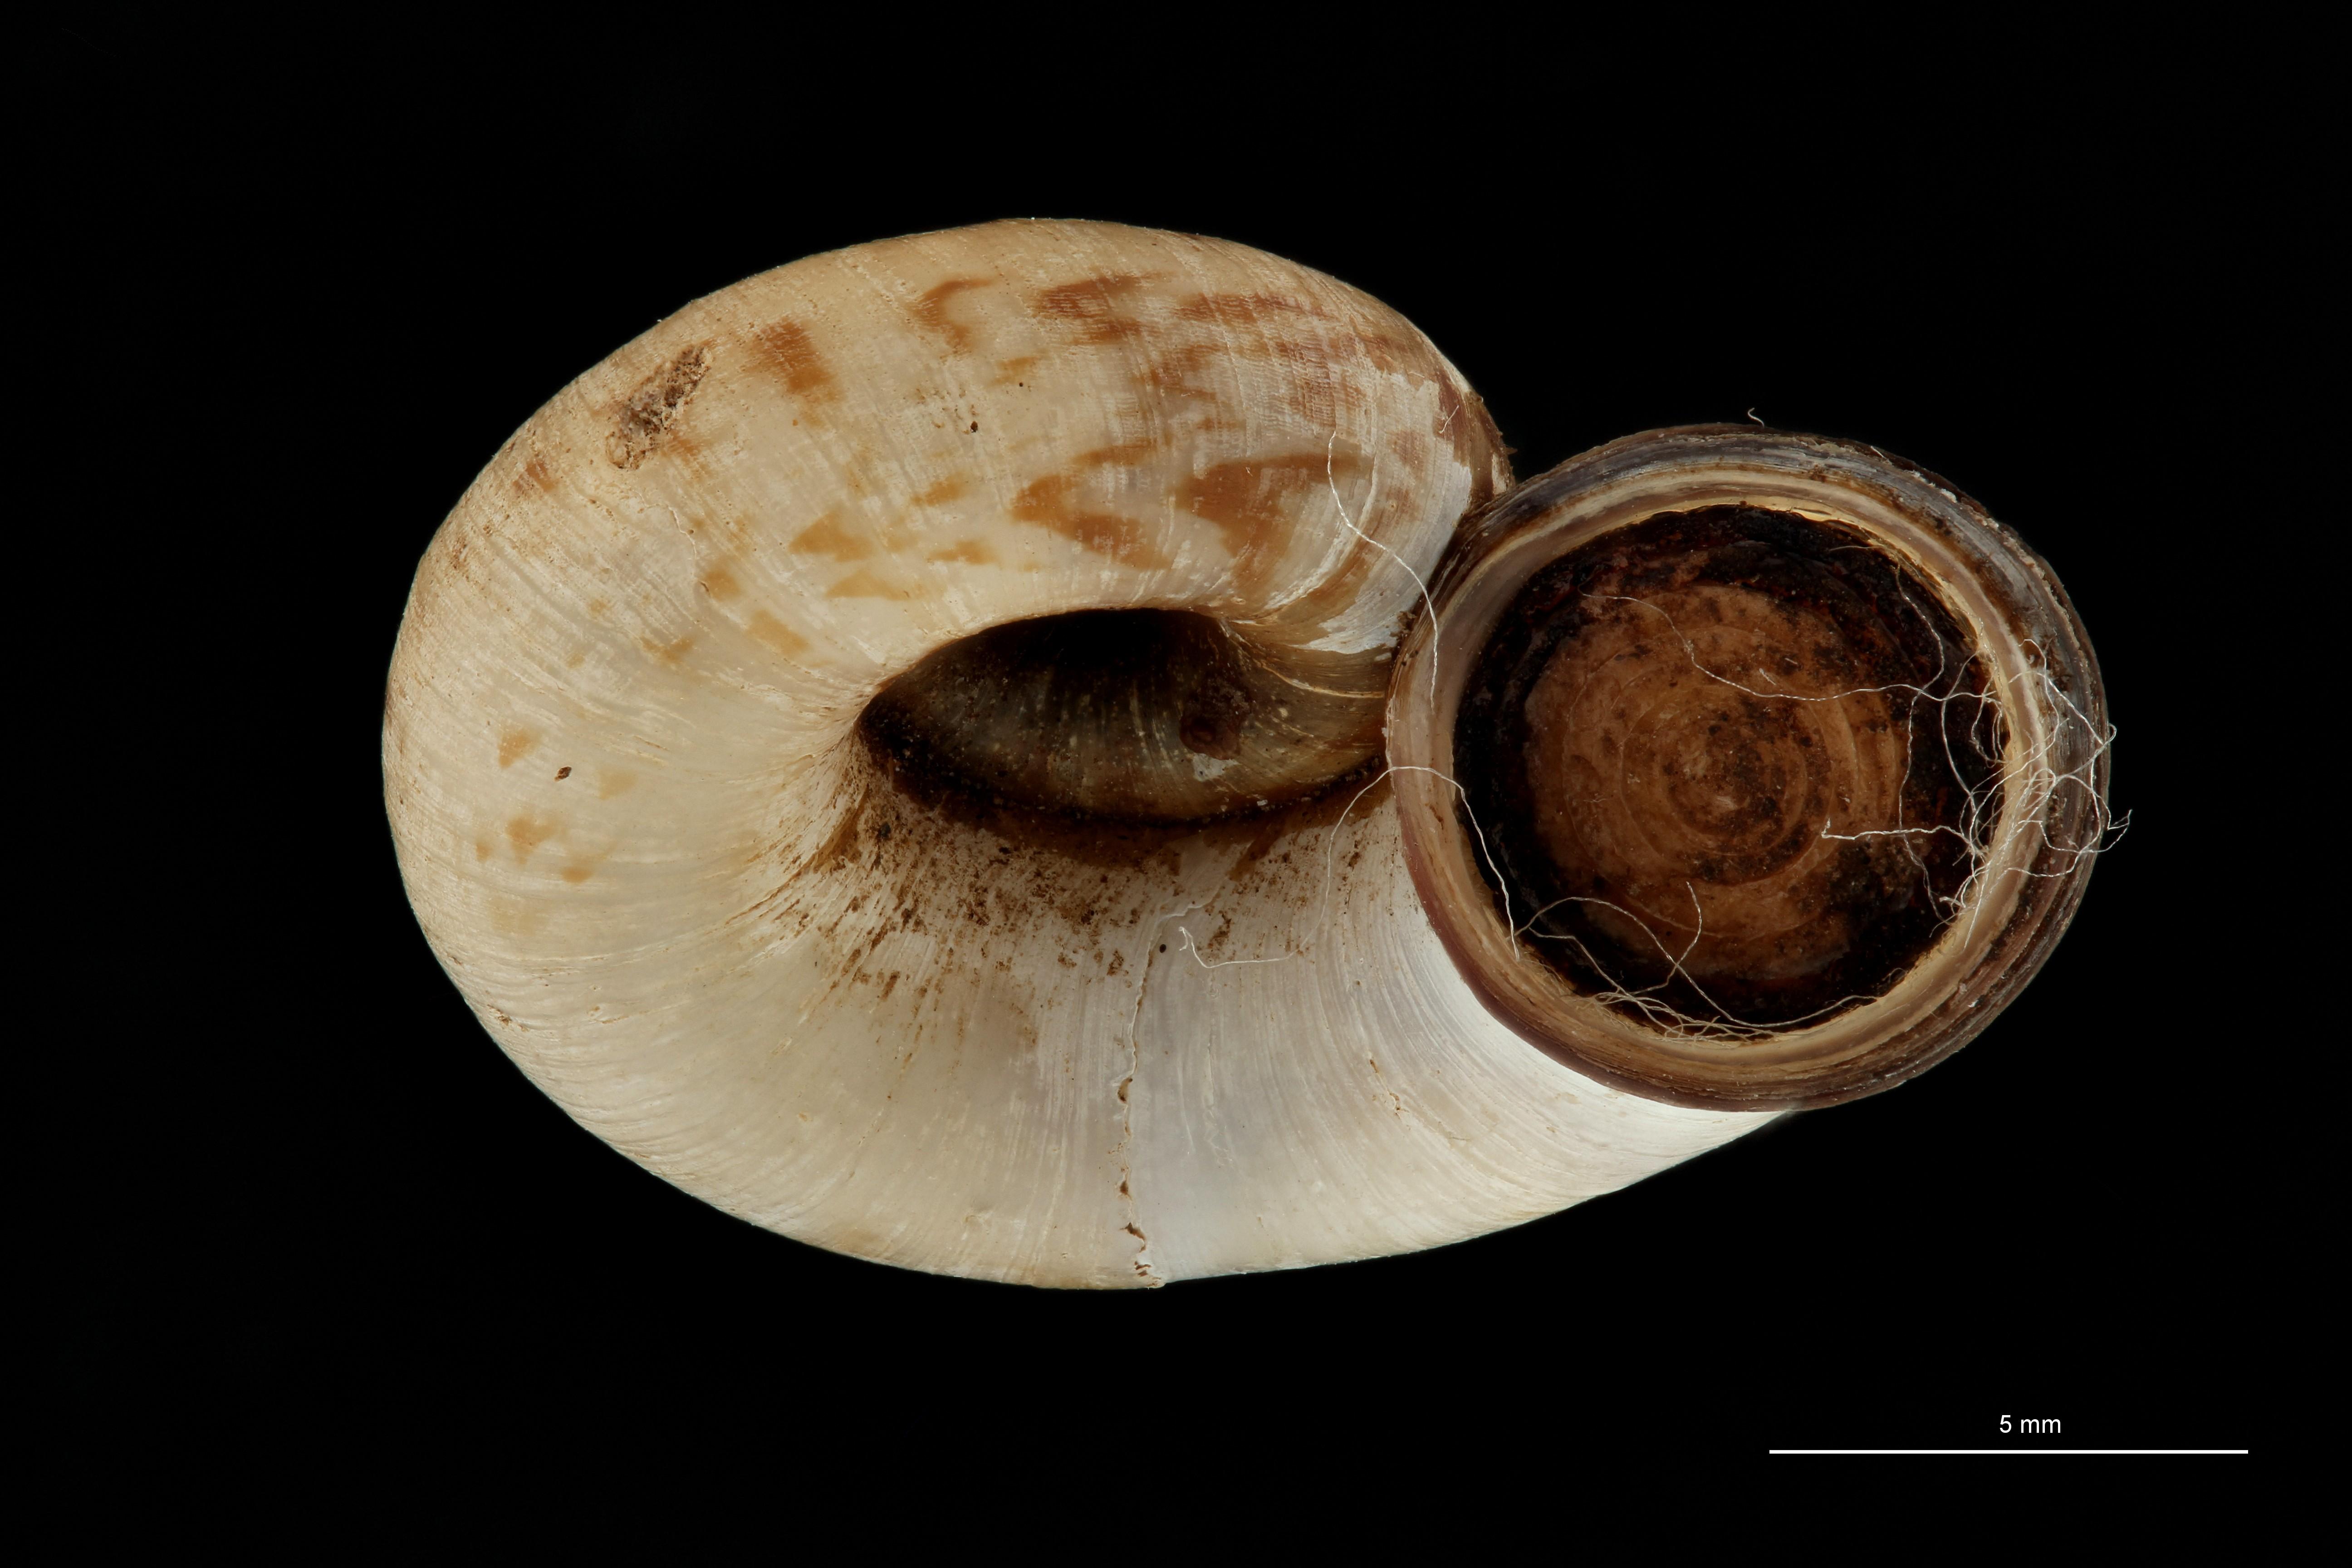 0571 Scabrina melanotrema Typ L ZS PMax Scaled.jpg